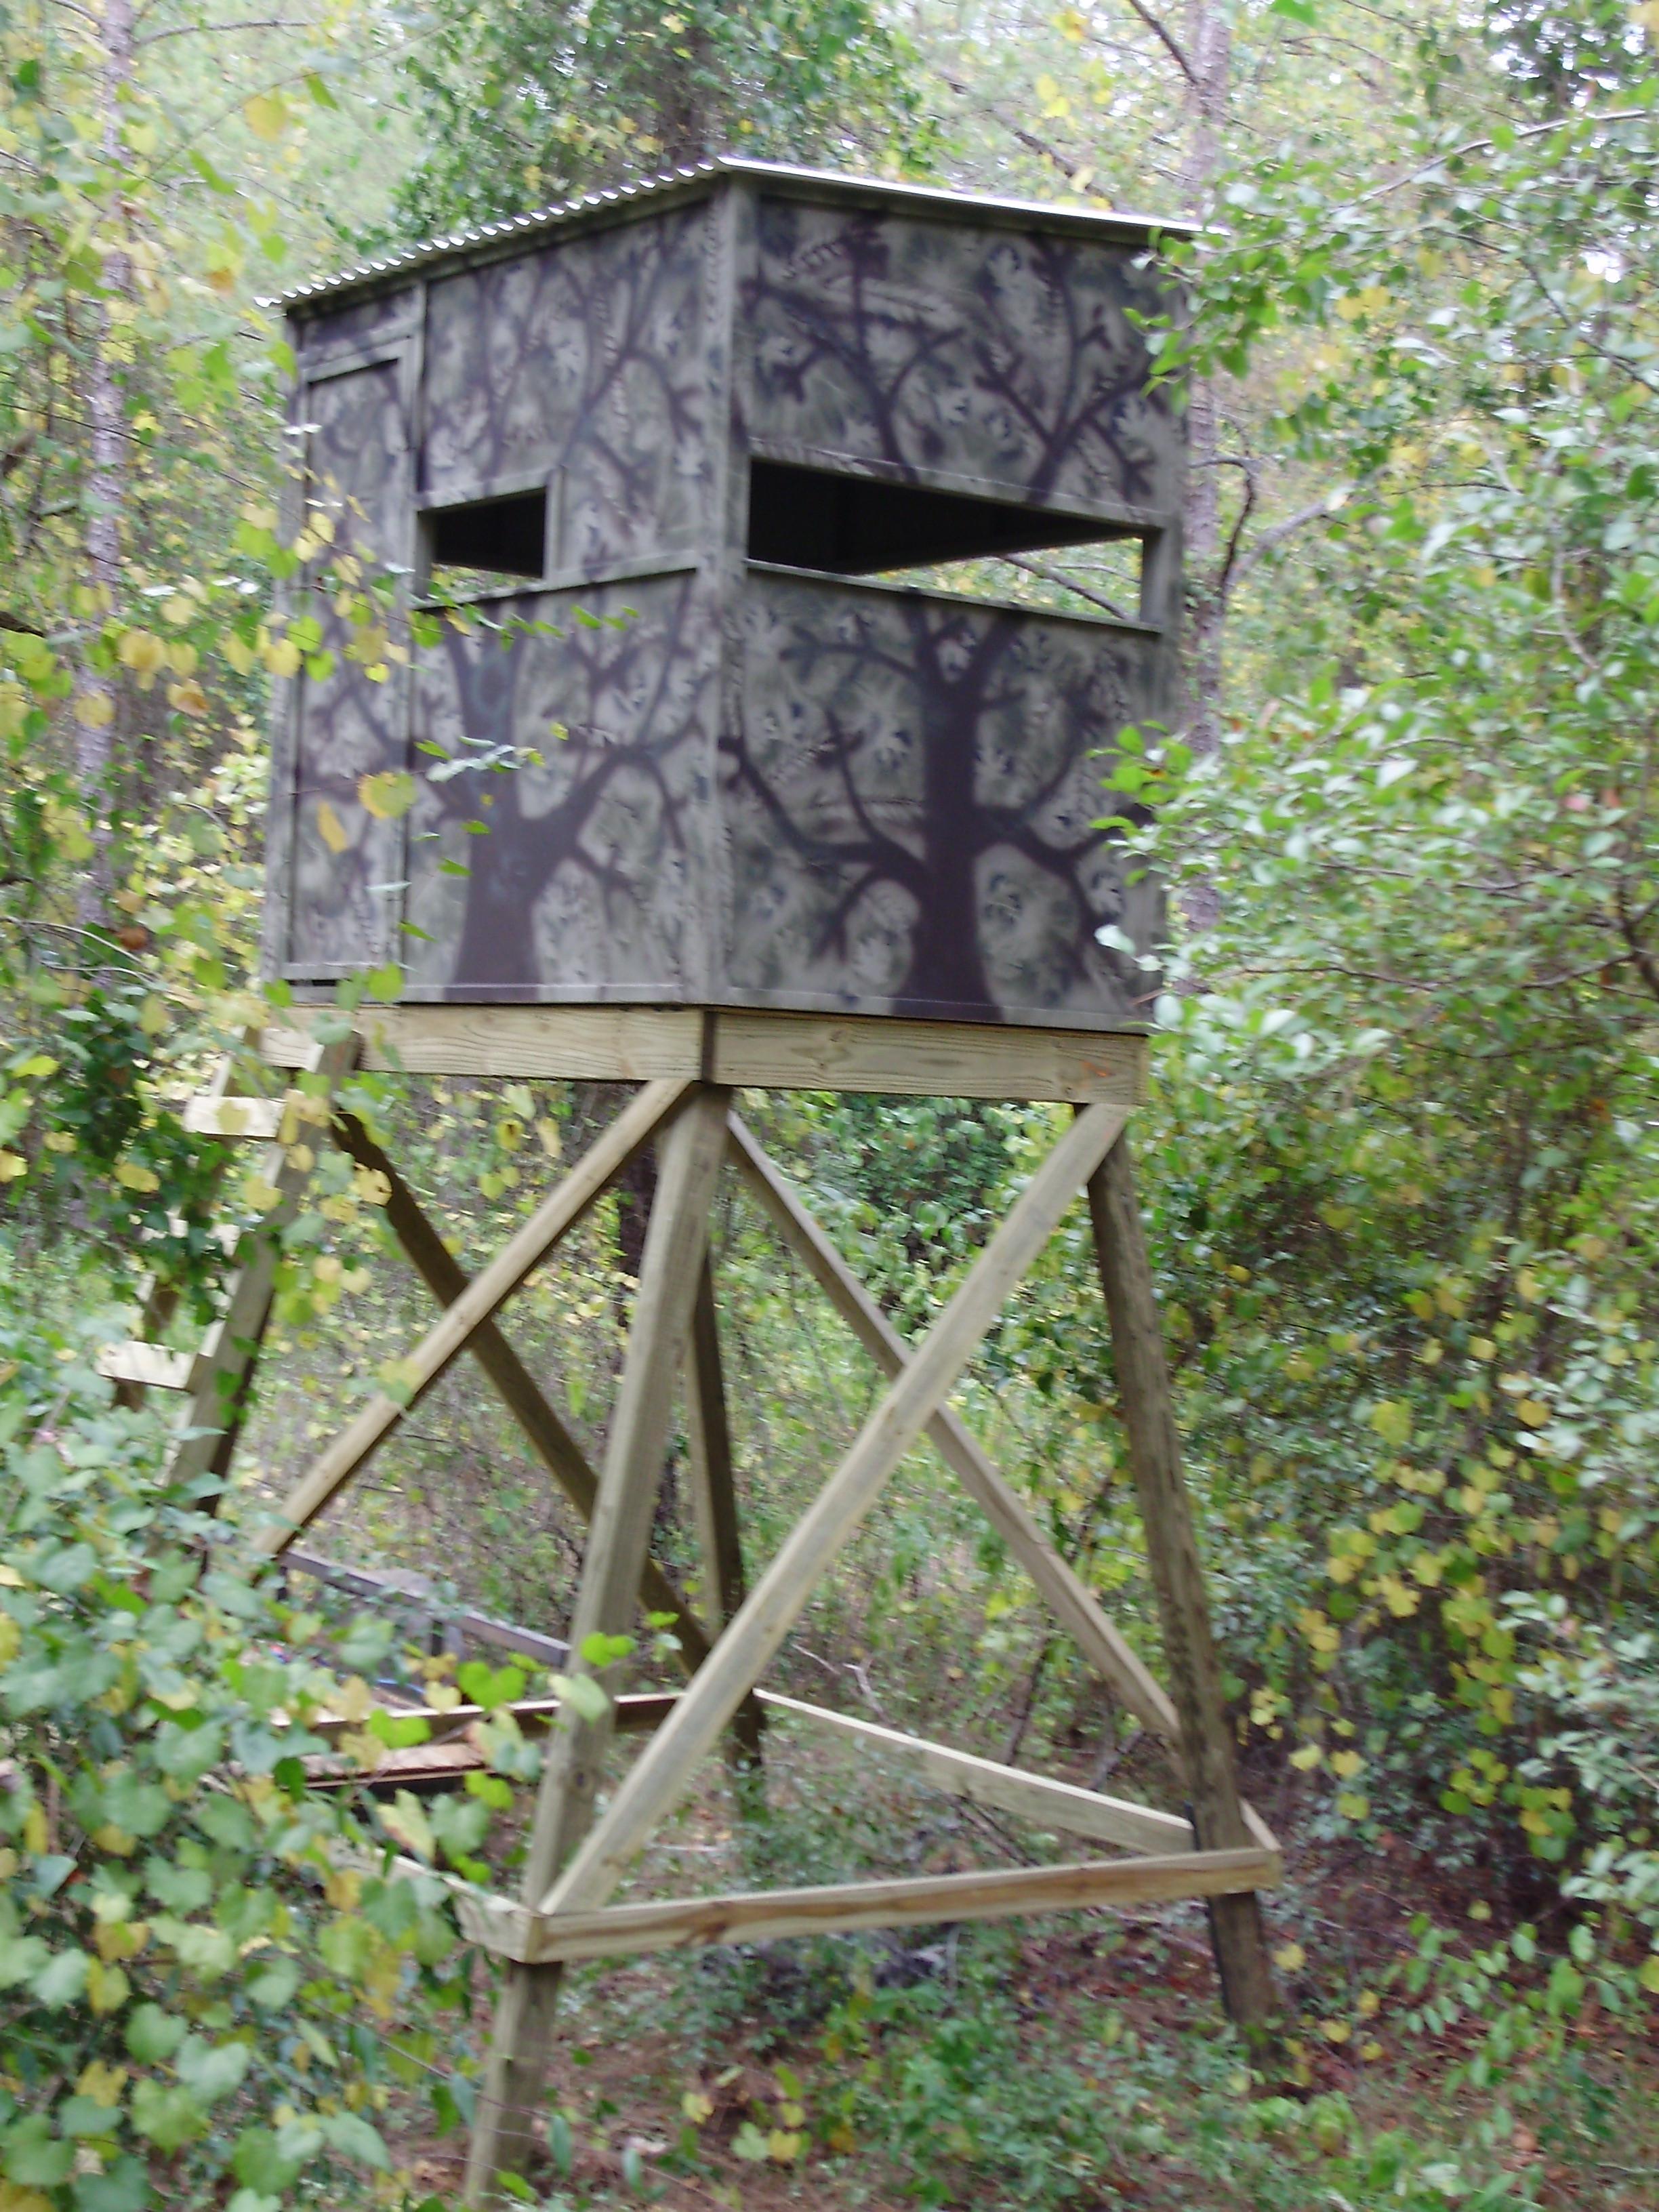 DIY Deer Stands Plans  Wood Deer Stands Plans Free Download